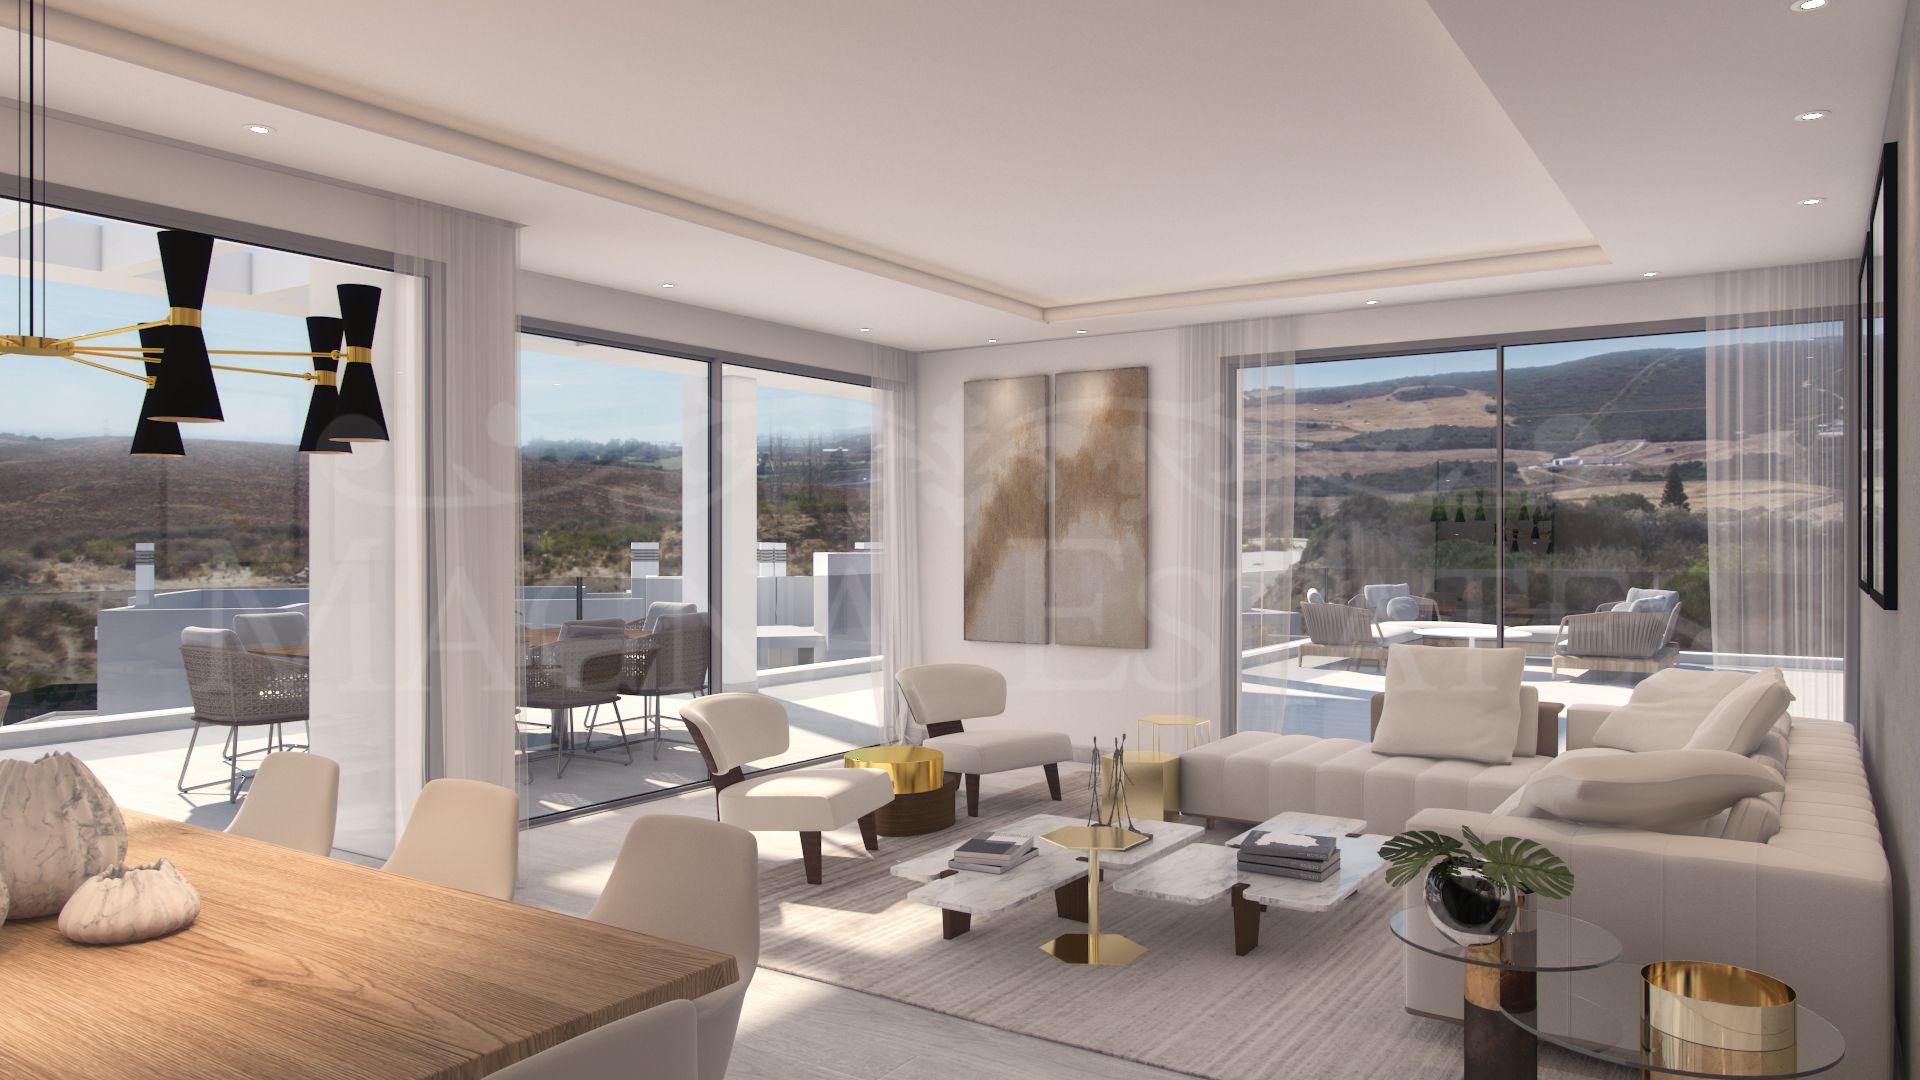 2 bedroom apartment in Alcazaba Lagoon, Estepona